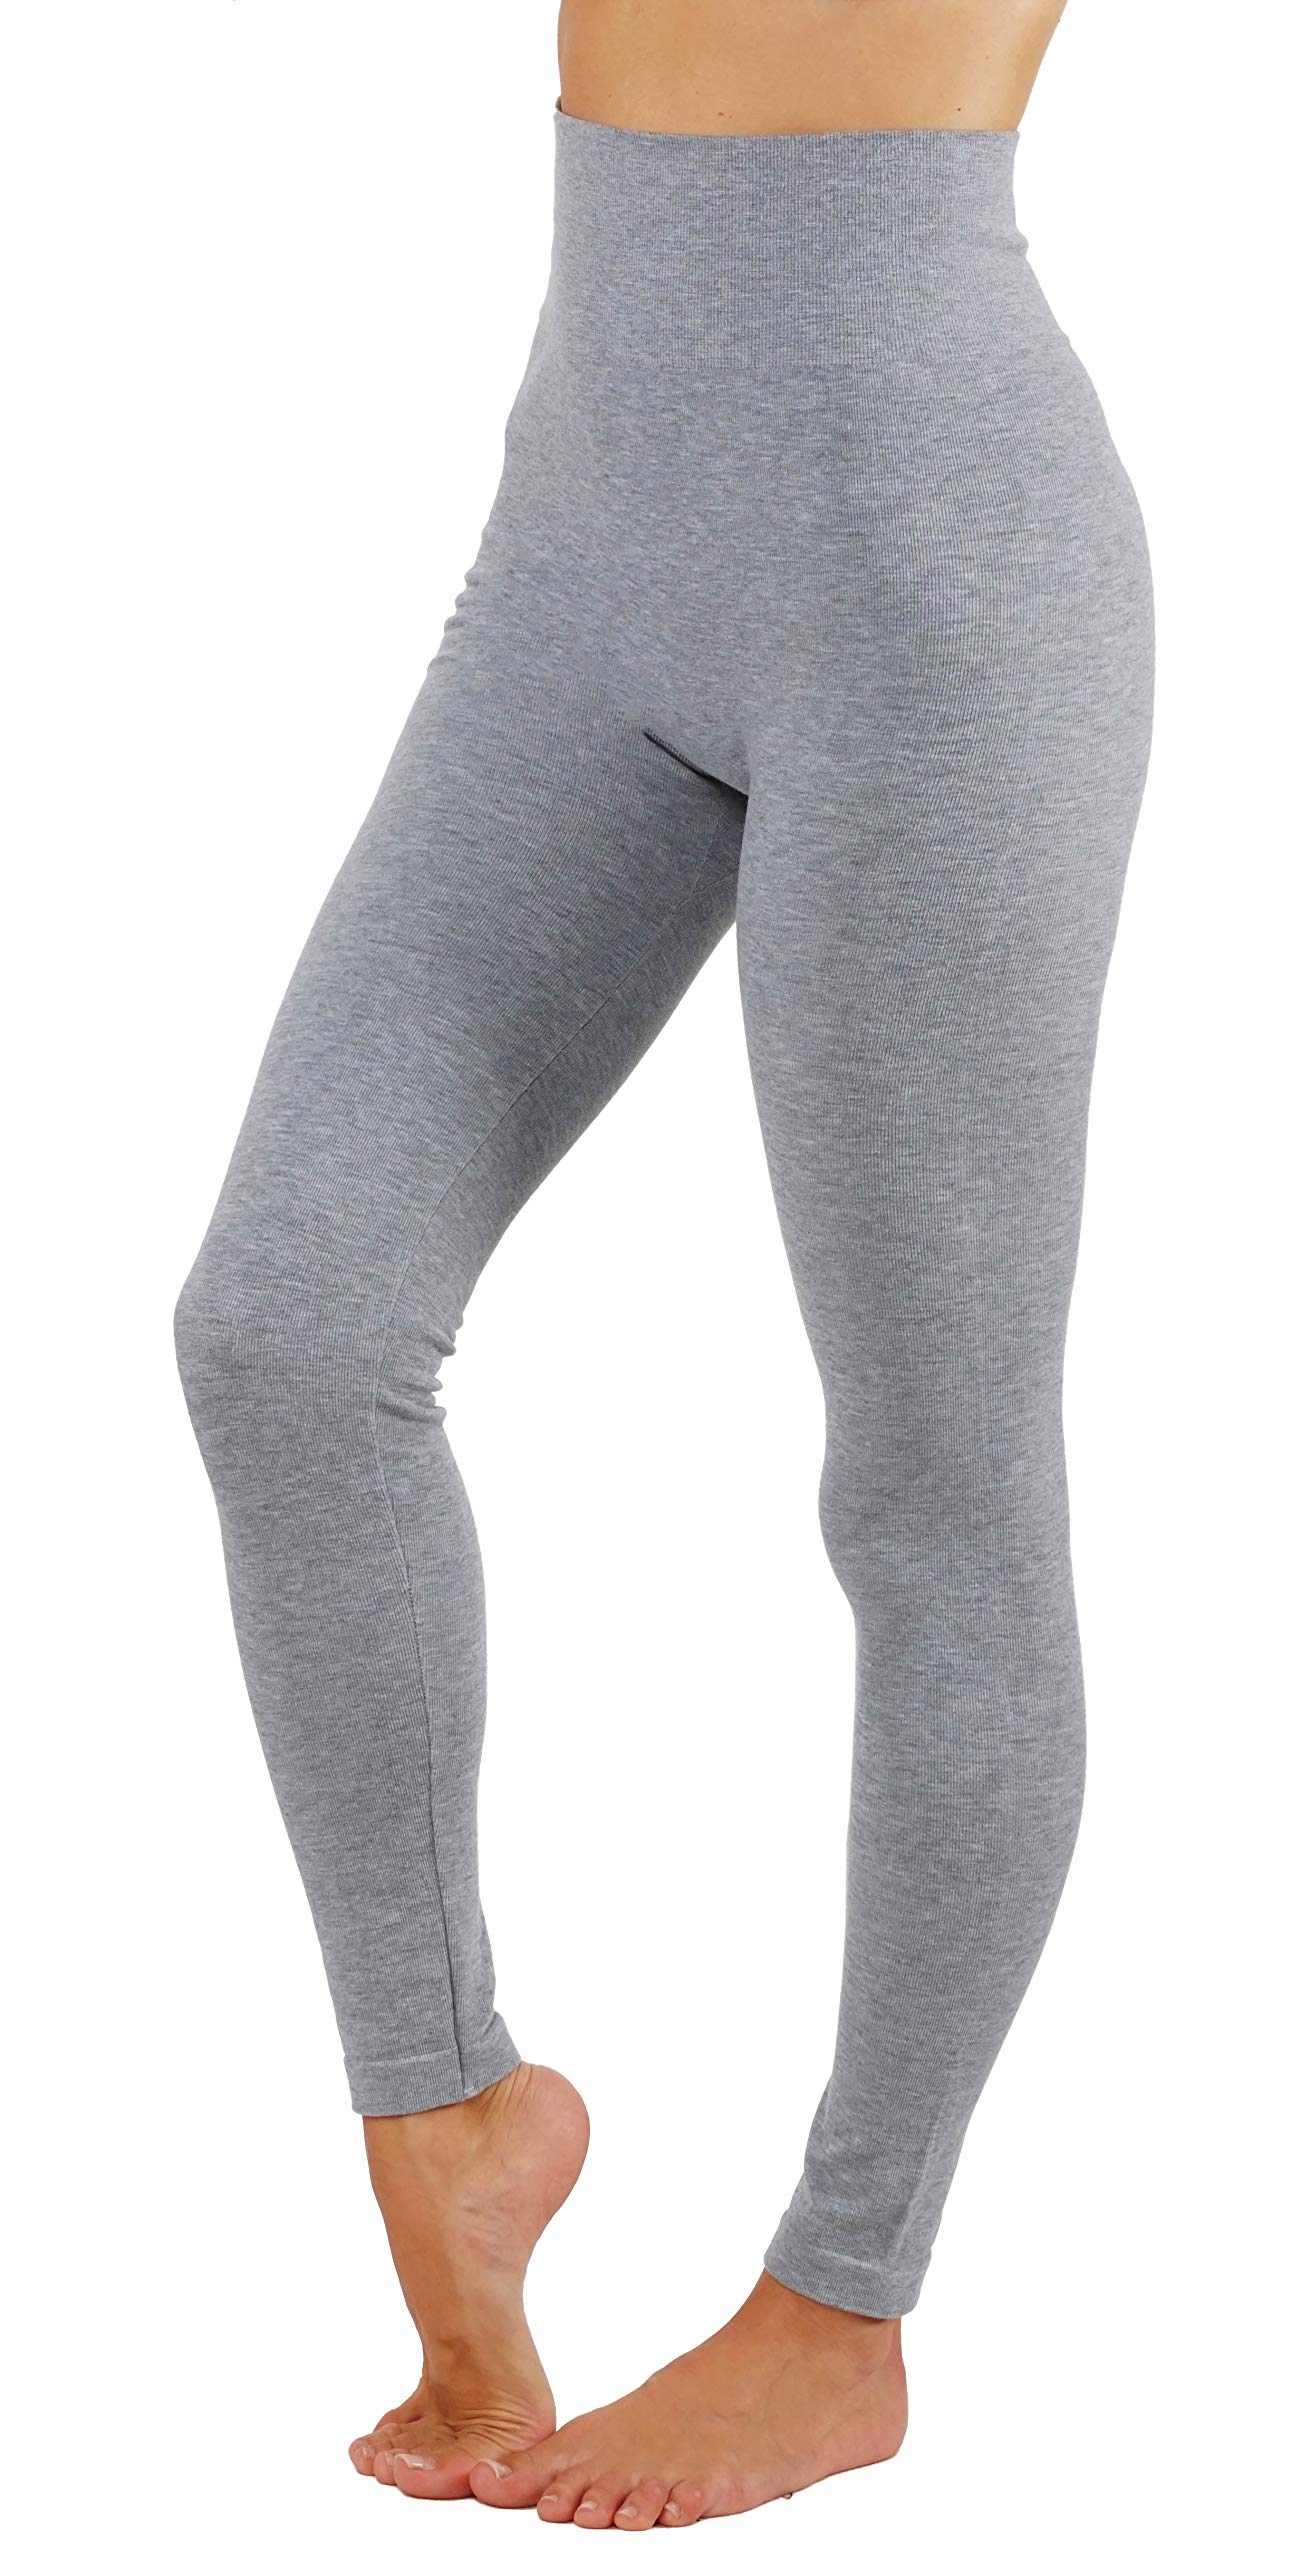 Women's Leggings Soft Basic Coton Blend Solid Color Yoga Pants Wide Waistband (S/M US 2-6, YG010-L,Gry)